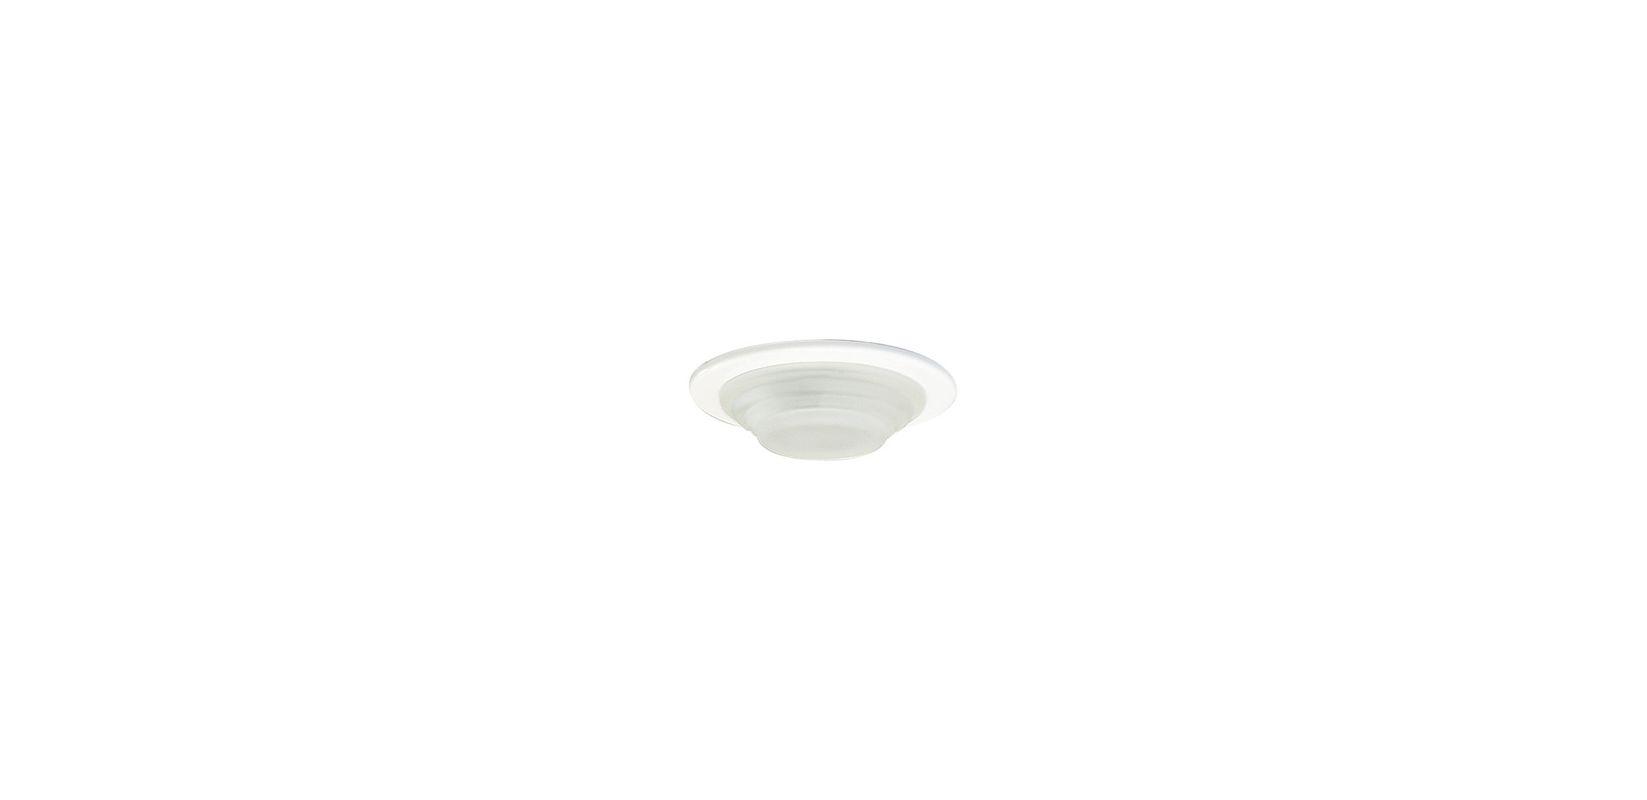 Elco E234 20W Single Light Mini MR16 Downlight with Shower Trim